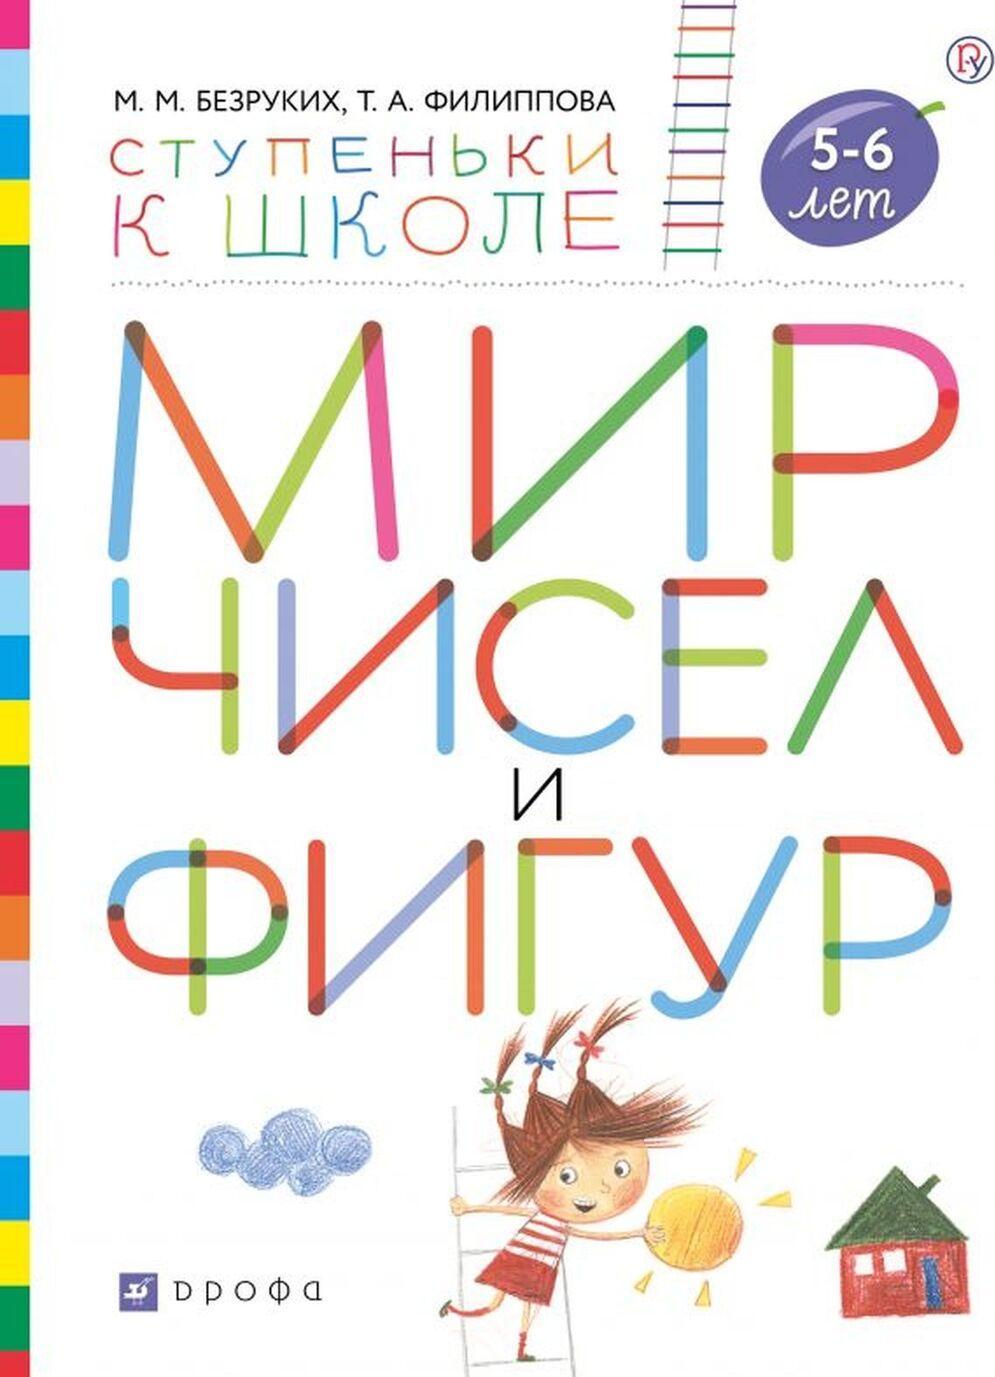 Mir chisel i figur. Posobie dlja detej 5-6 let | Bezrukikh Marjana Mikhajlovna, Filippova Tatjana Andreevna